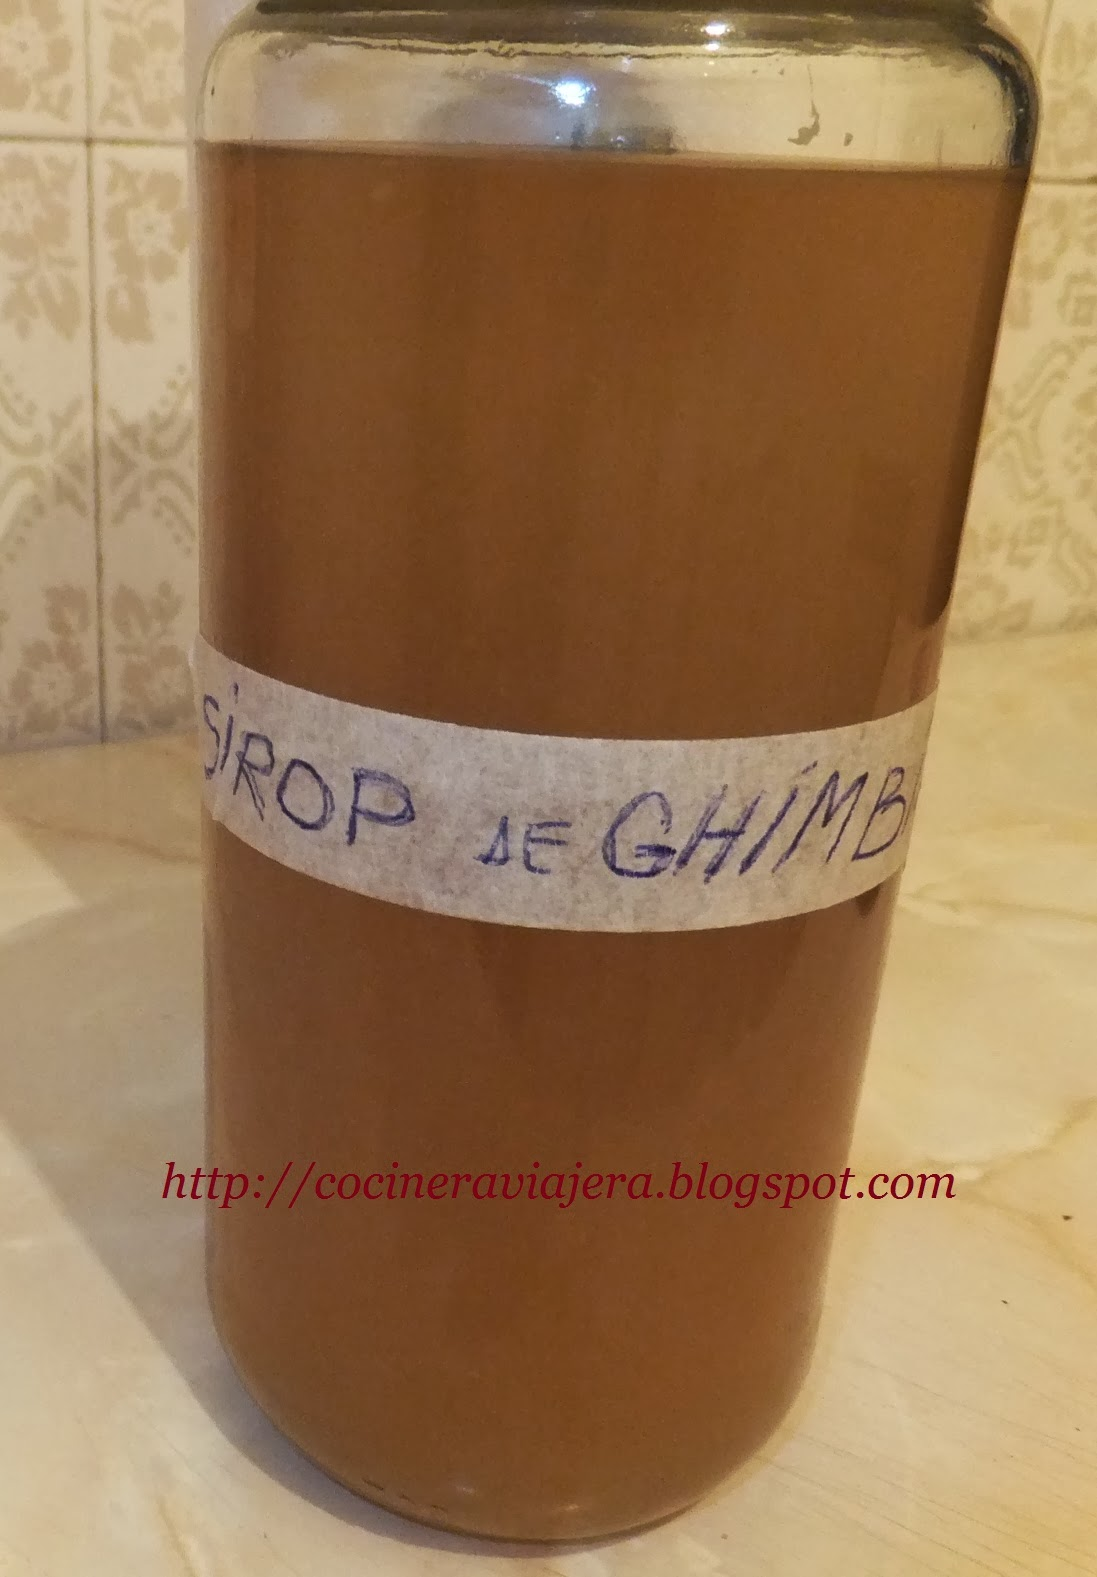 Sirop de ghimbir/Ginger syrup